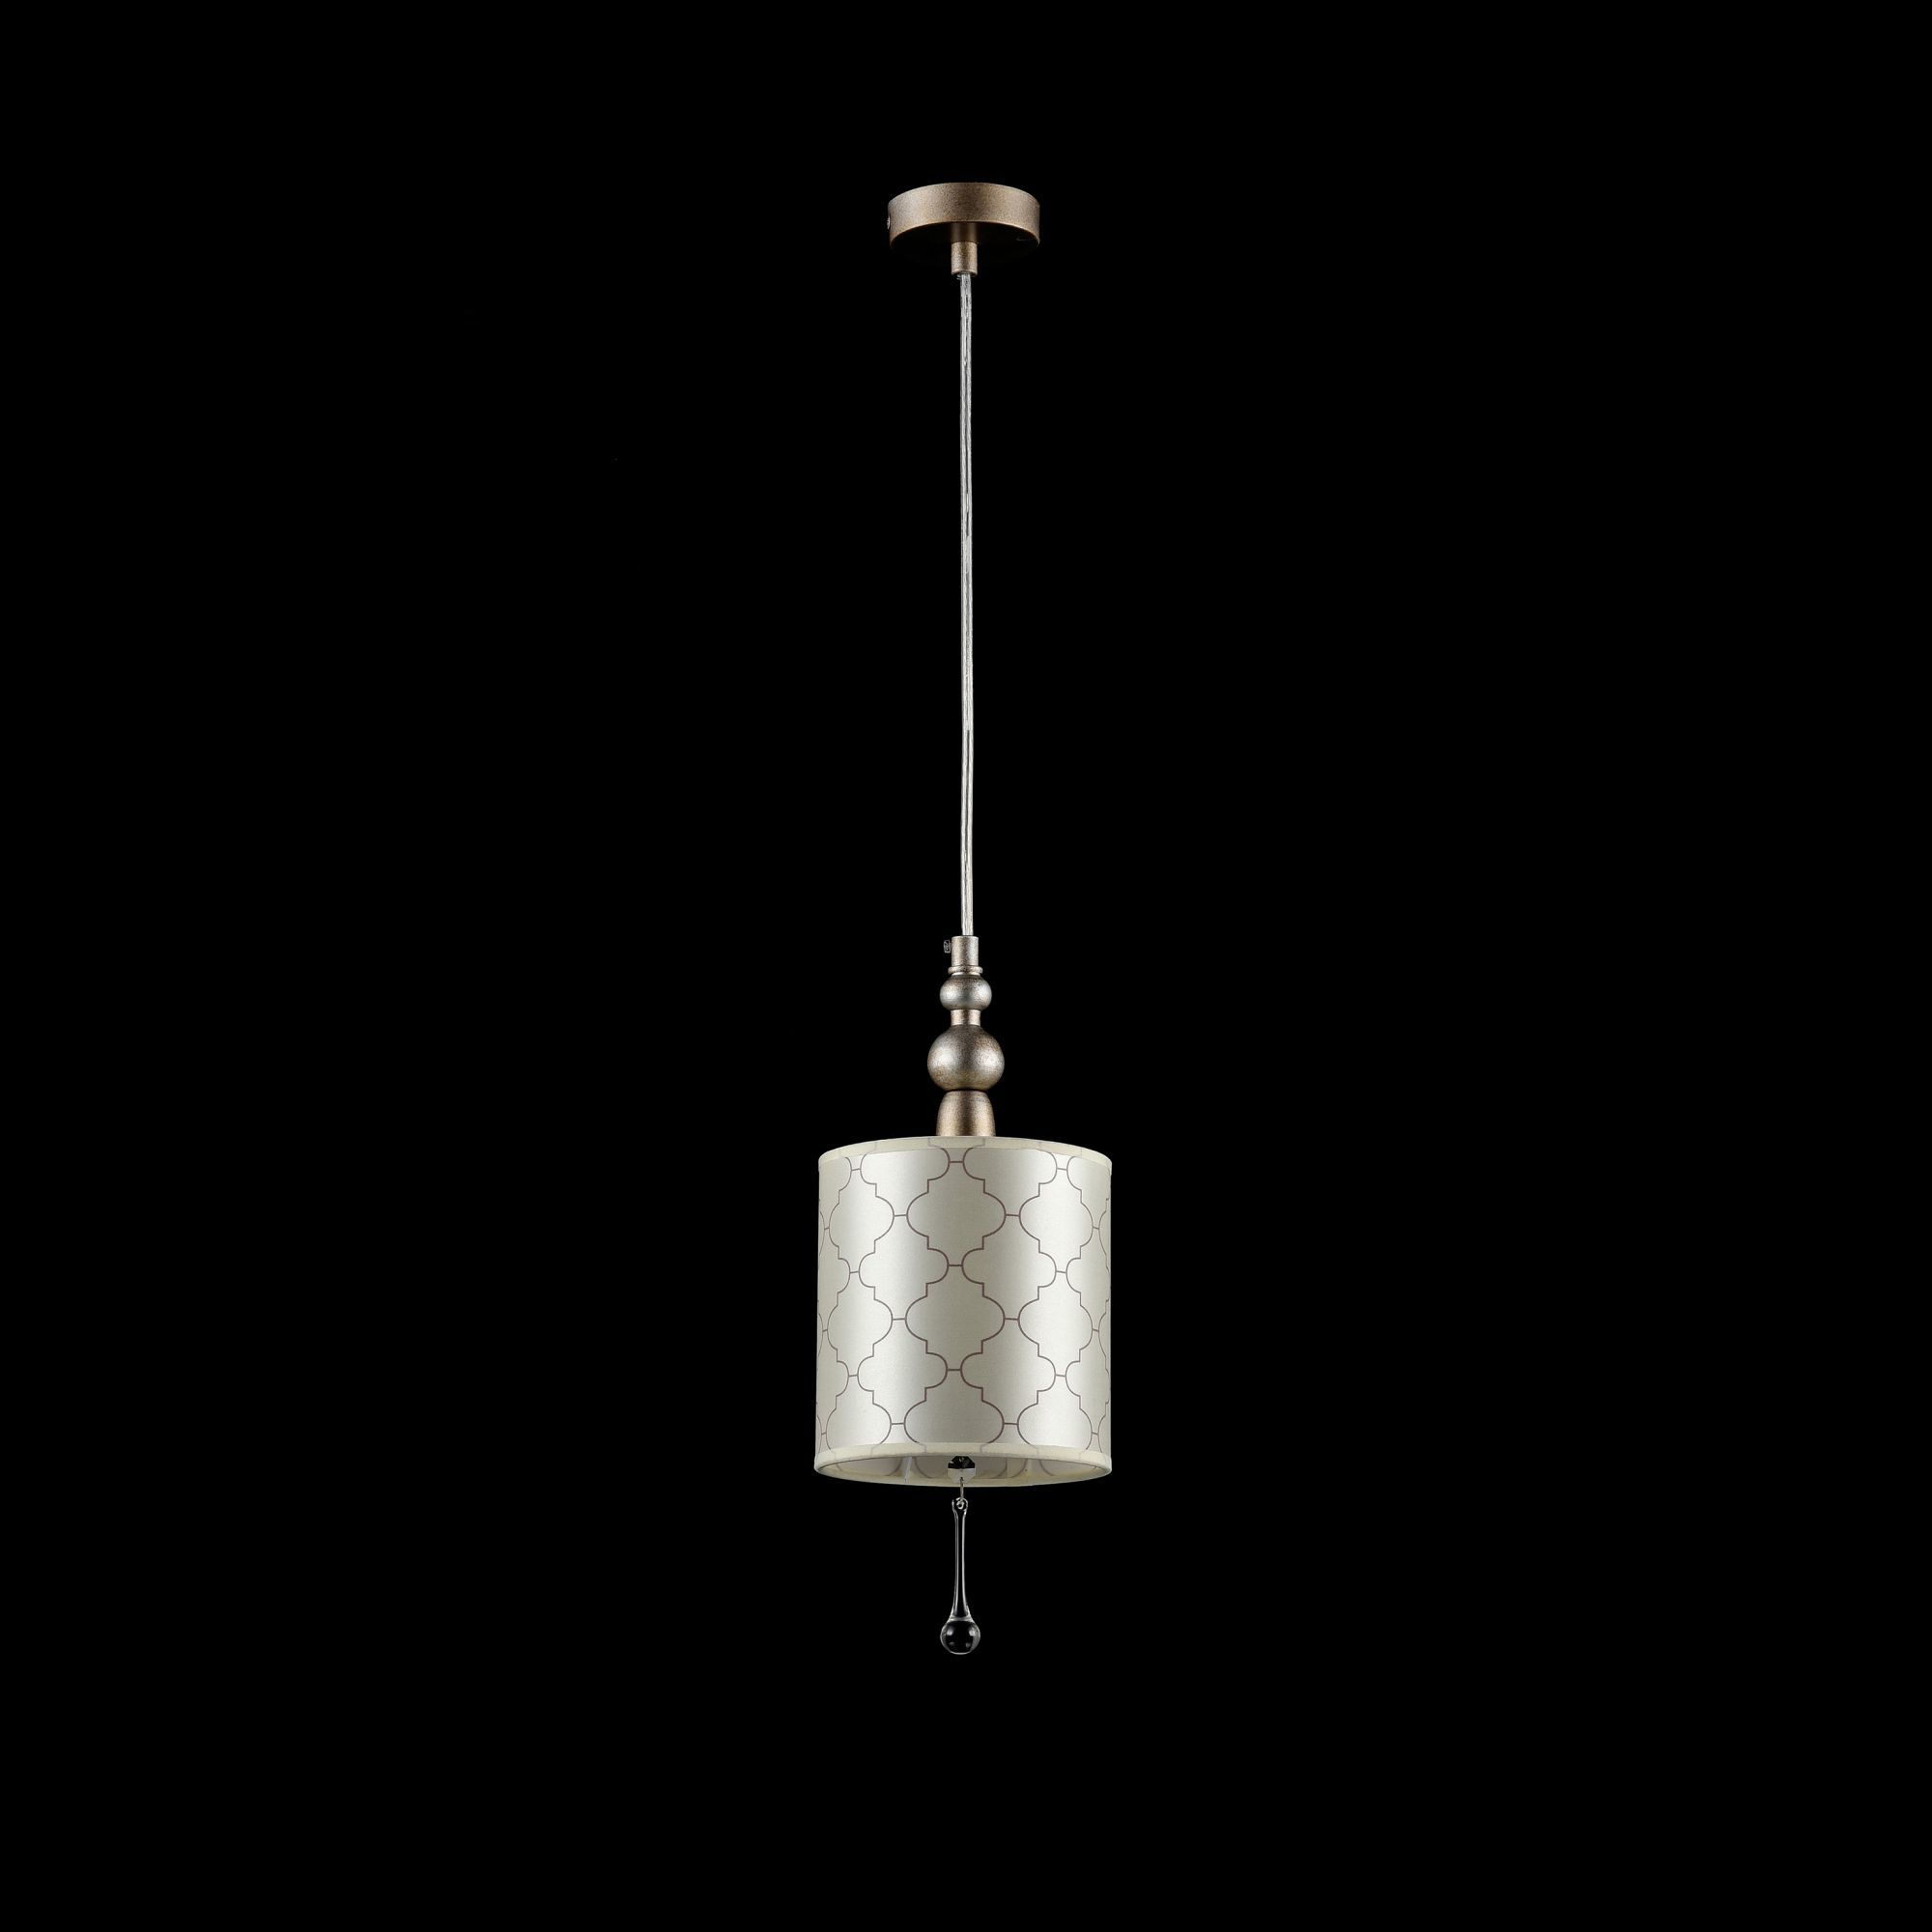 Подвесной светильник Maytoni Bience H018-PL-01-NG (dia018-22-ng), 1xE14x40W, серебро, бежевый, прозрачный, металл, текстиль, хрусталь - фото 2